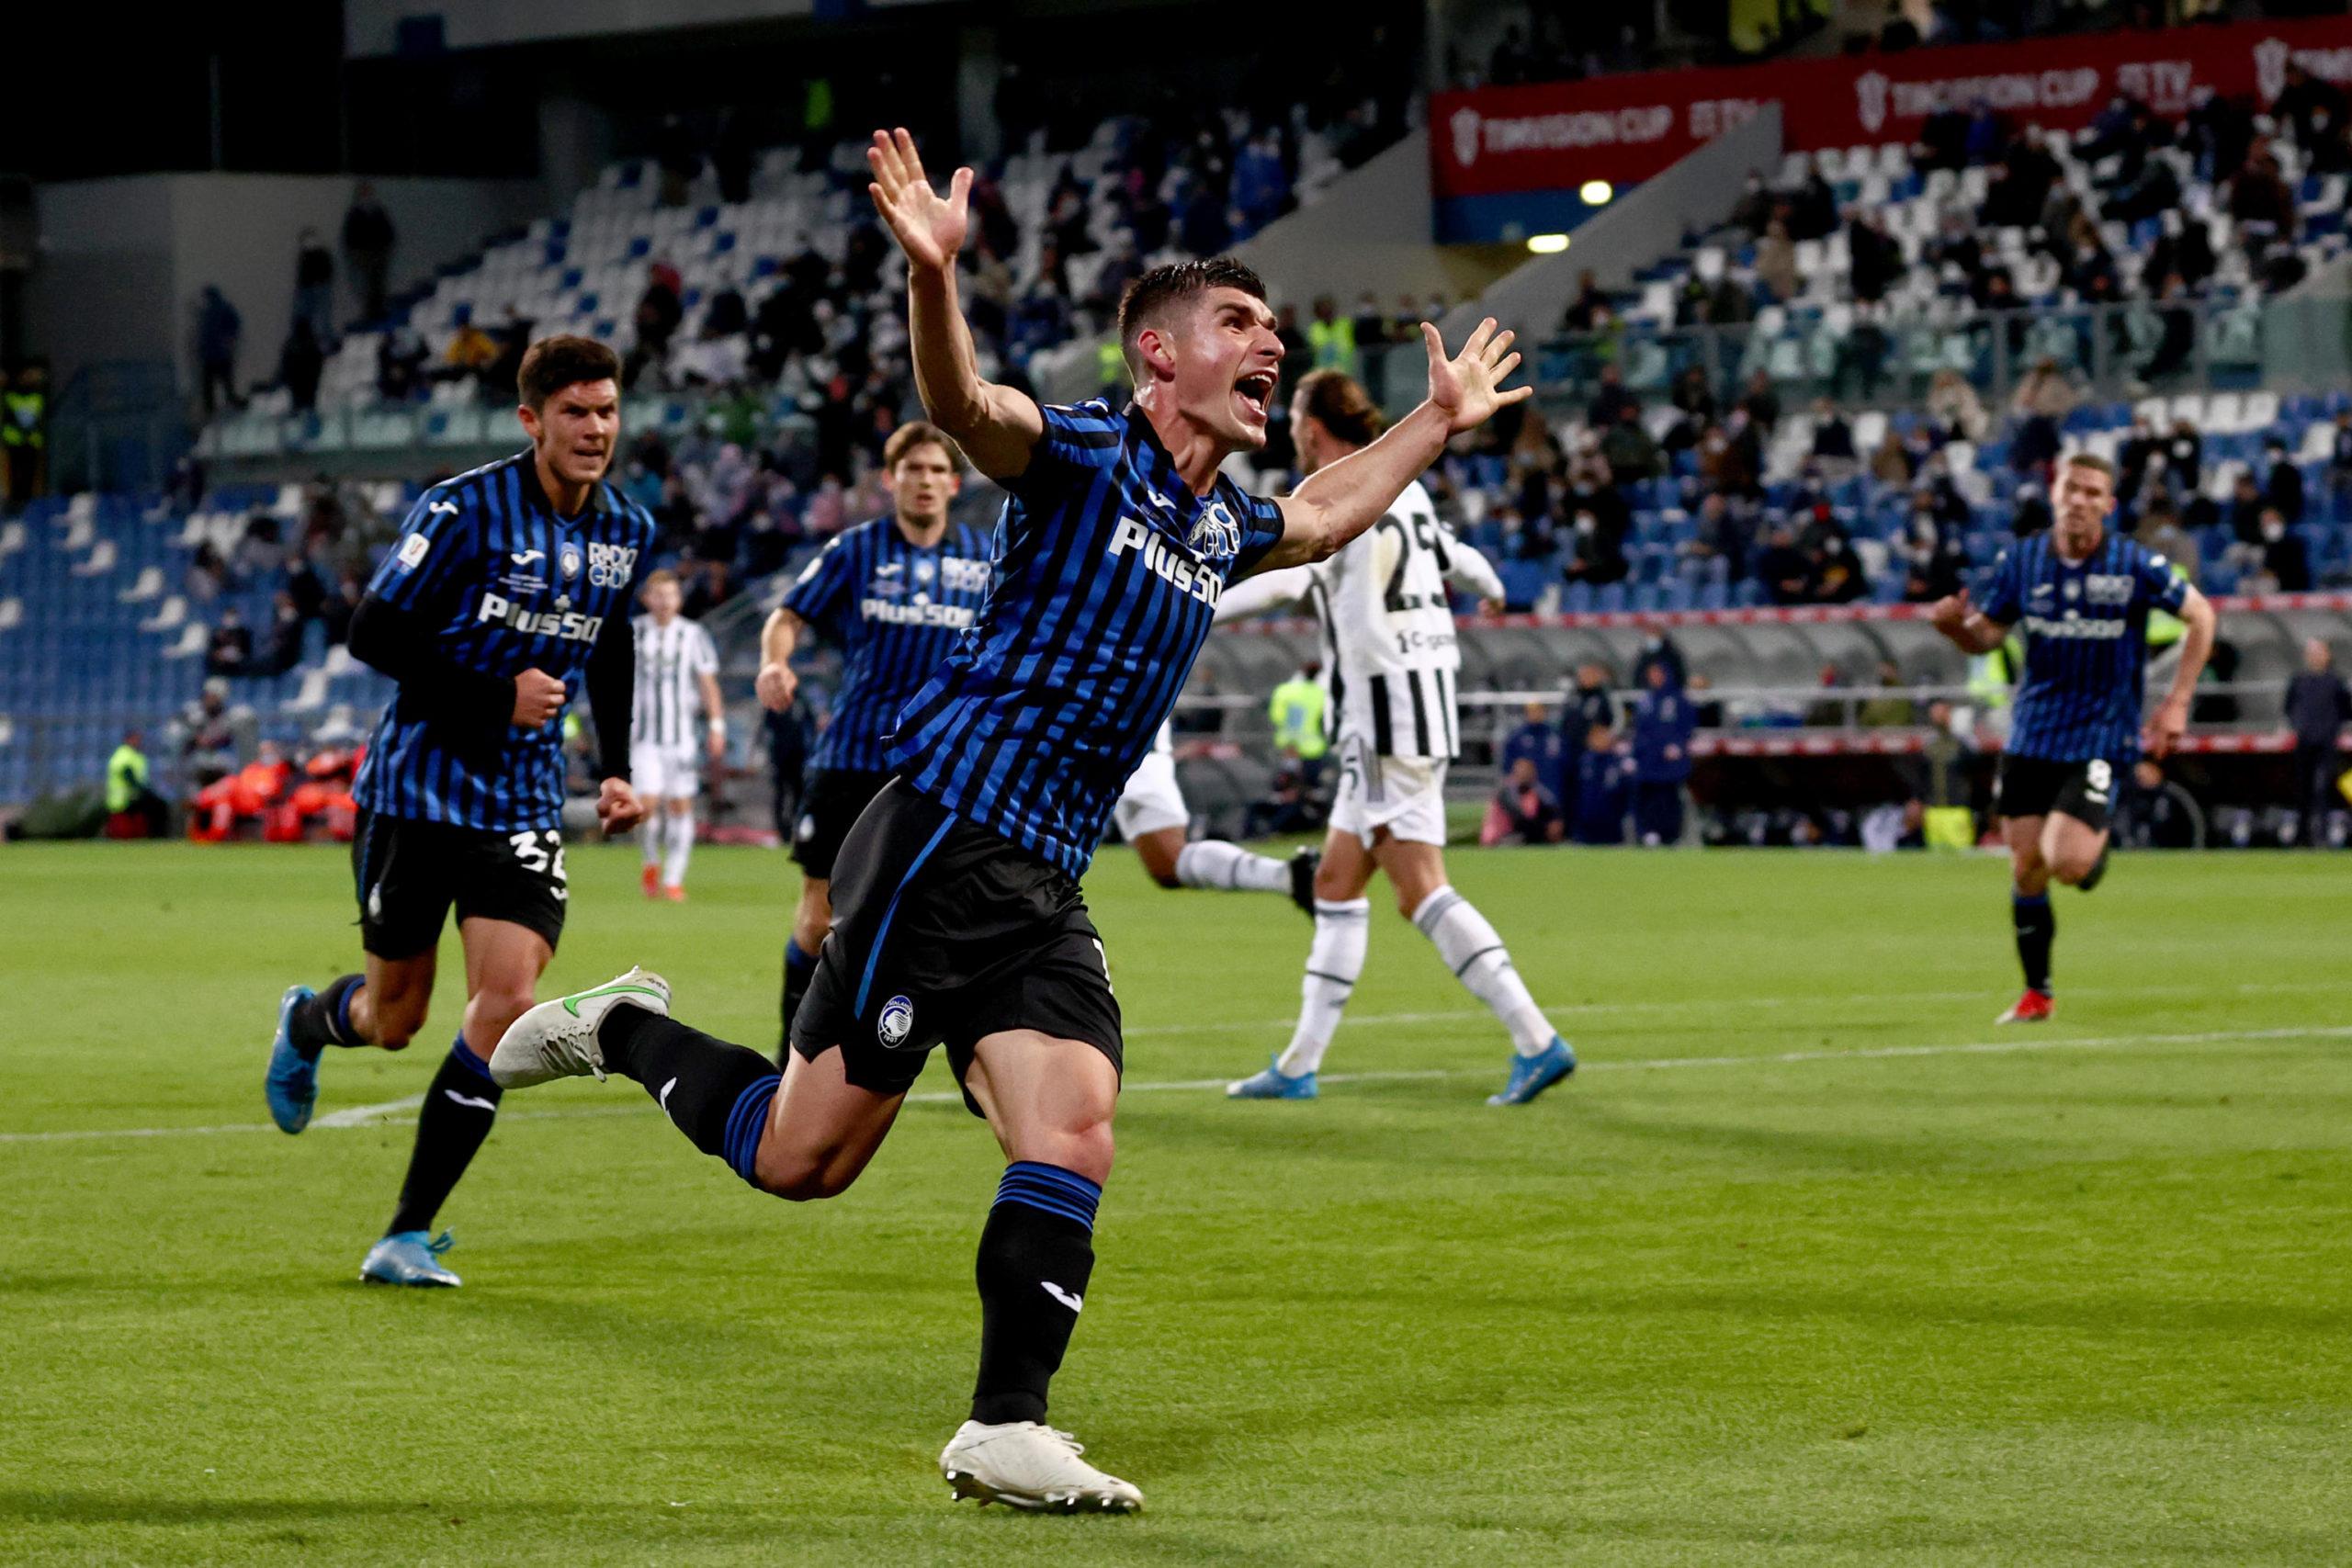 Ruslan Malinovskiy celebrates scoring for Atalanta against Juventus in the Coppa Italia Final